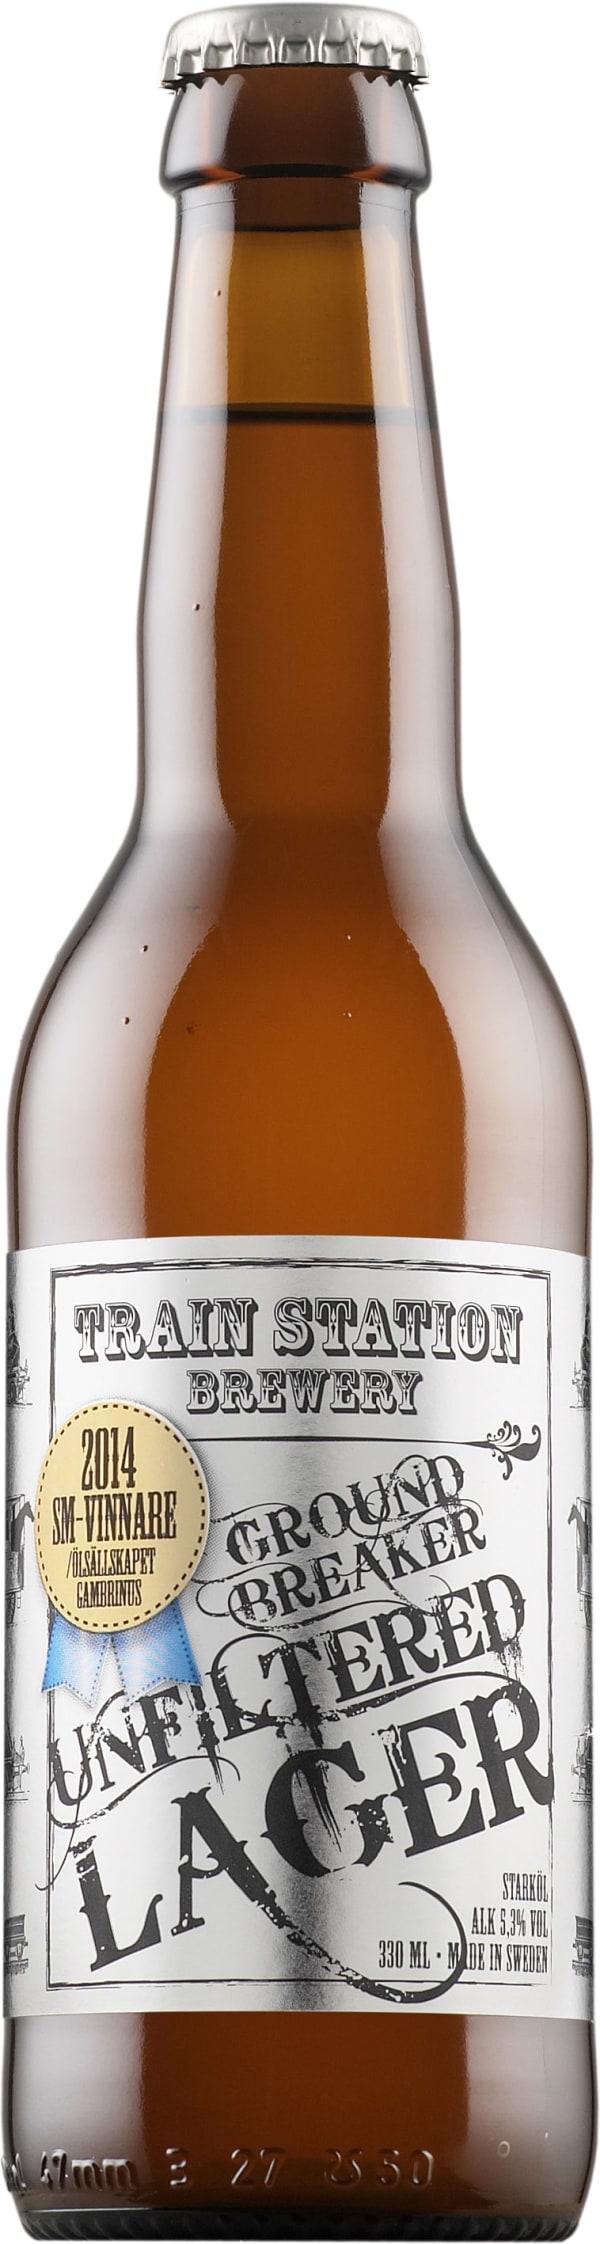 Train Station Brewery Groundbreaker